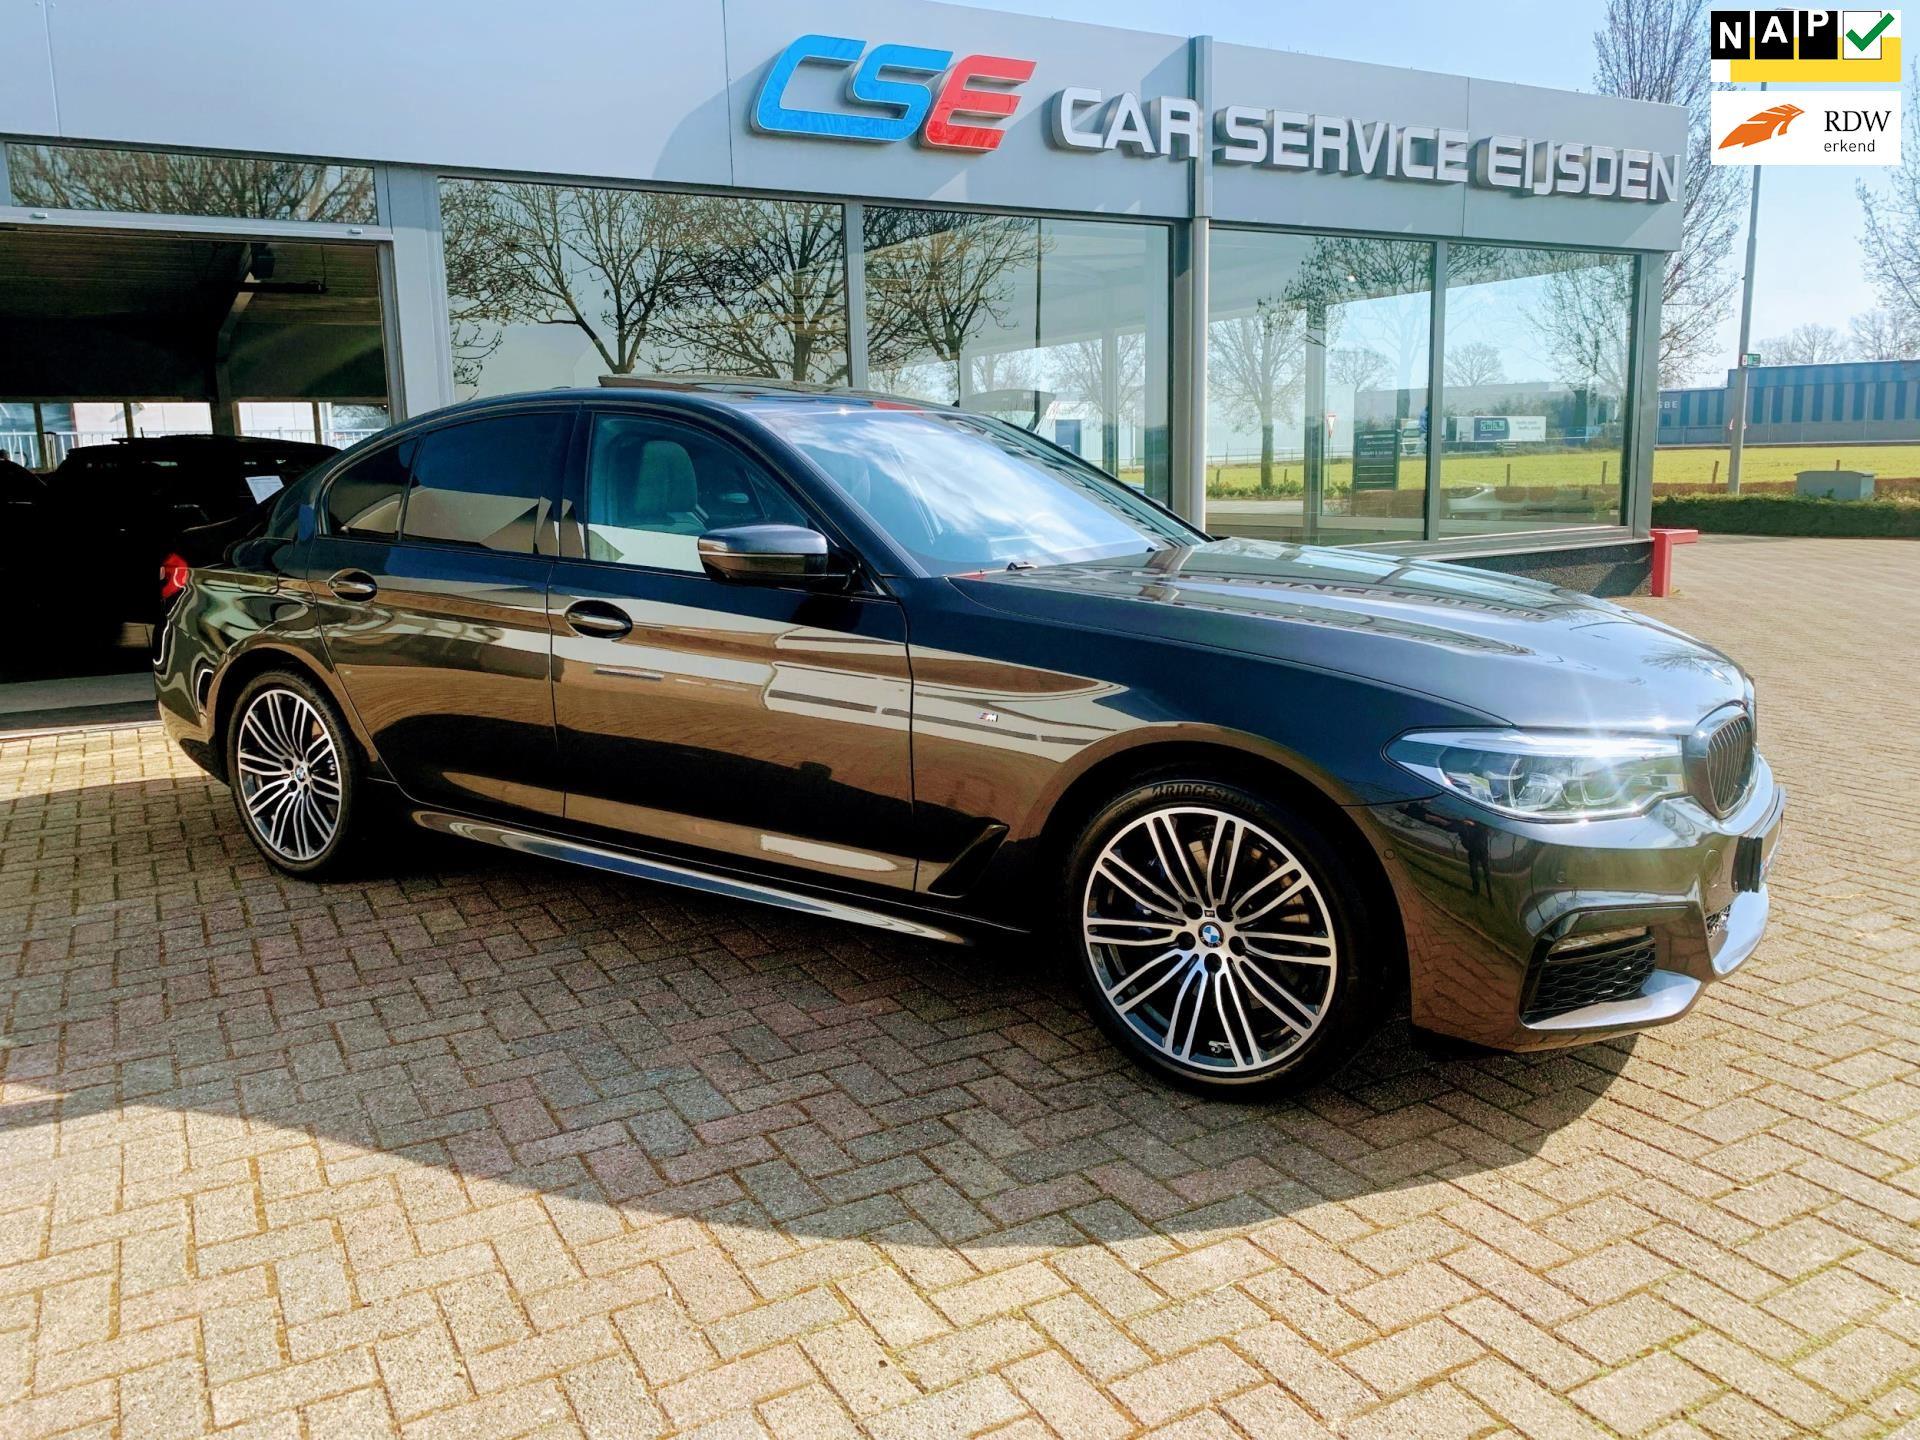 BMW 5-serie occasion - Car Service Eijsden